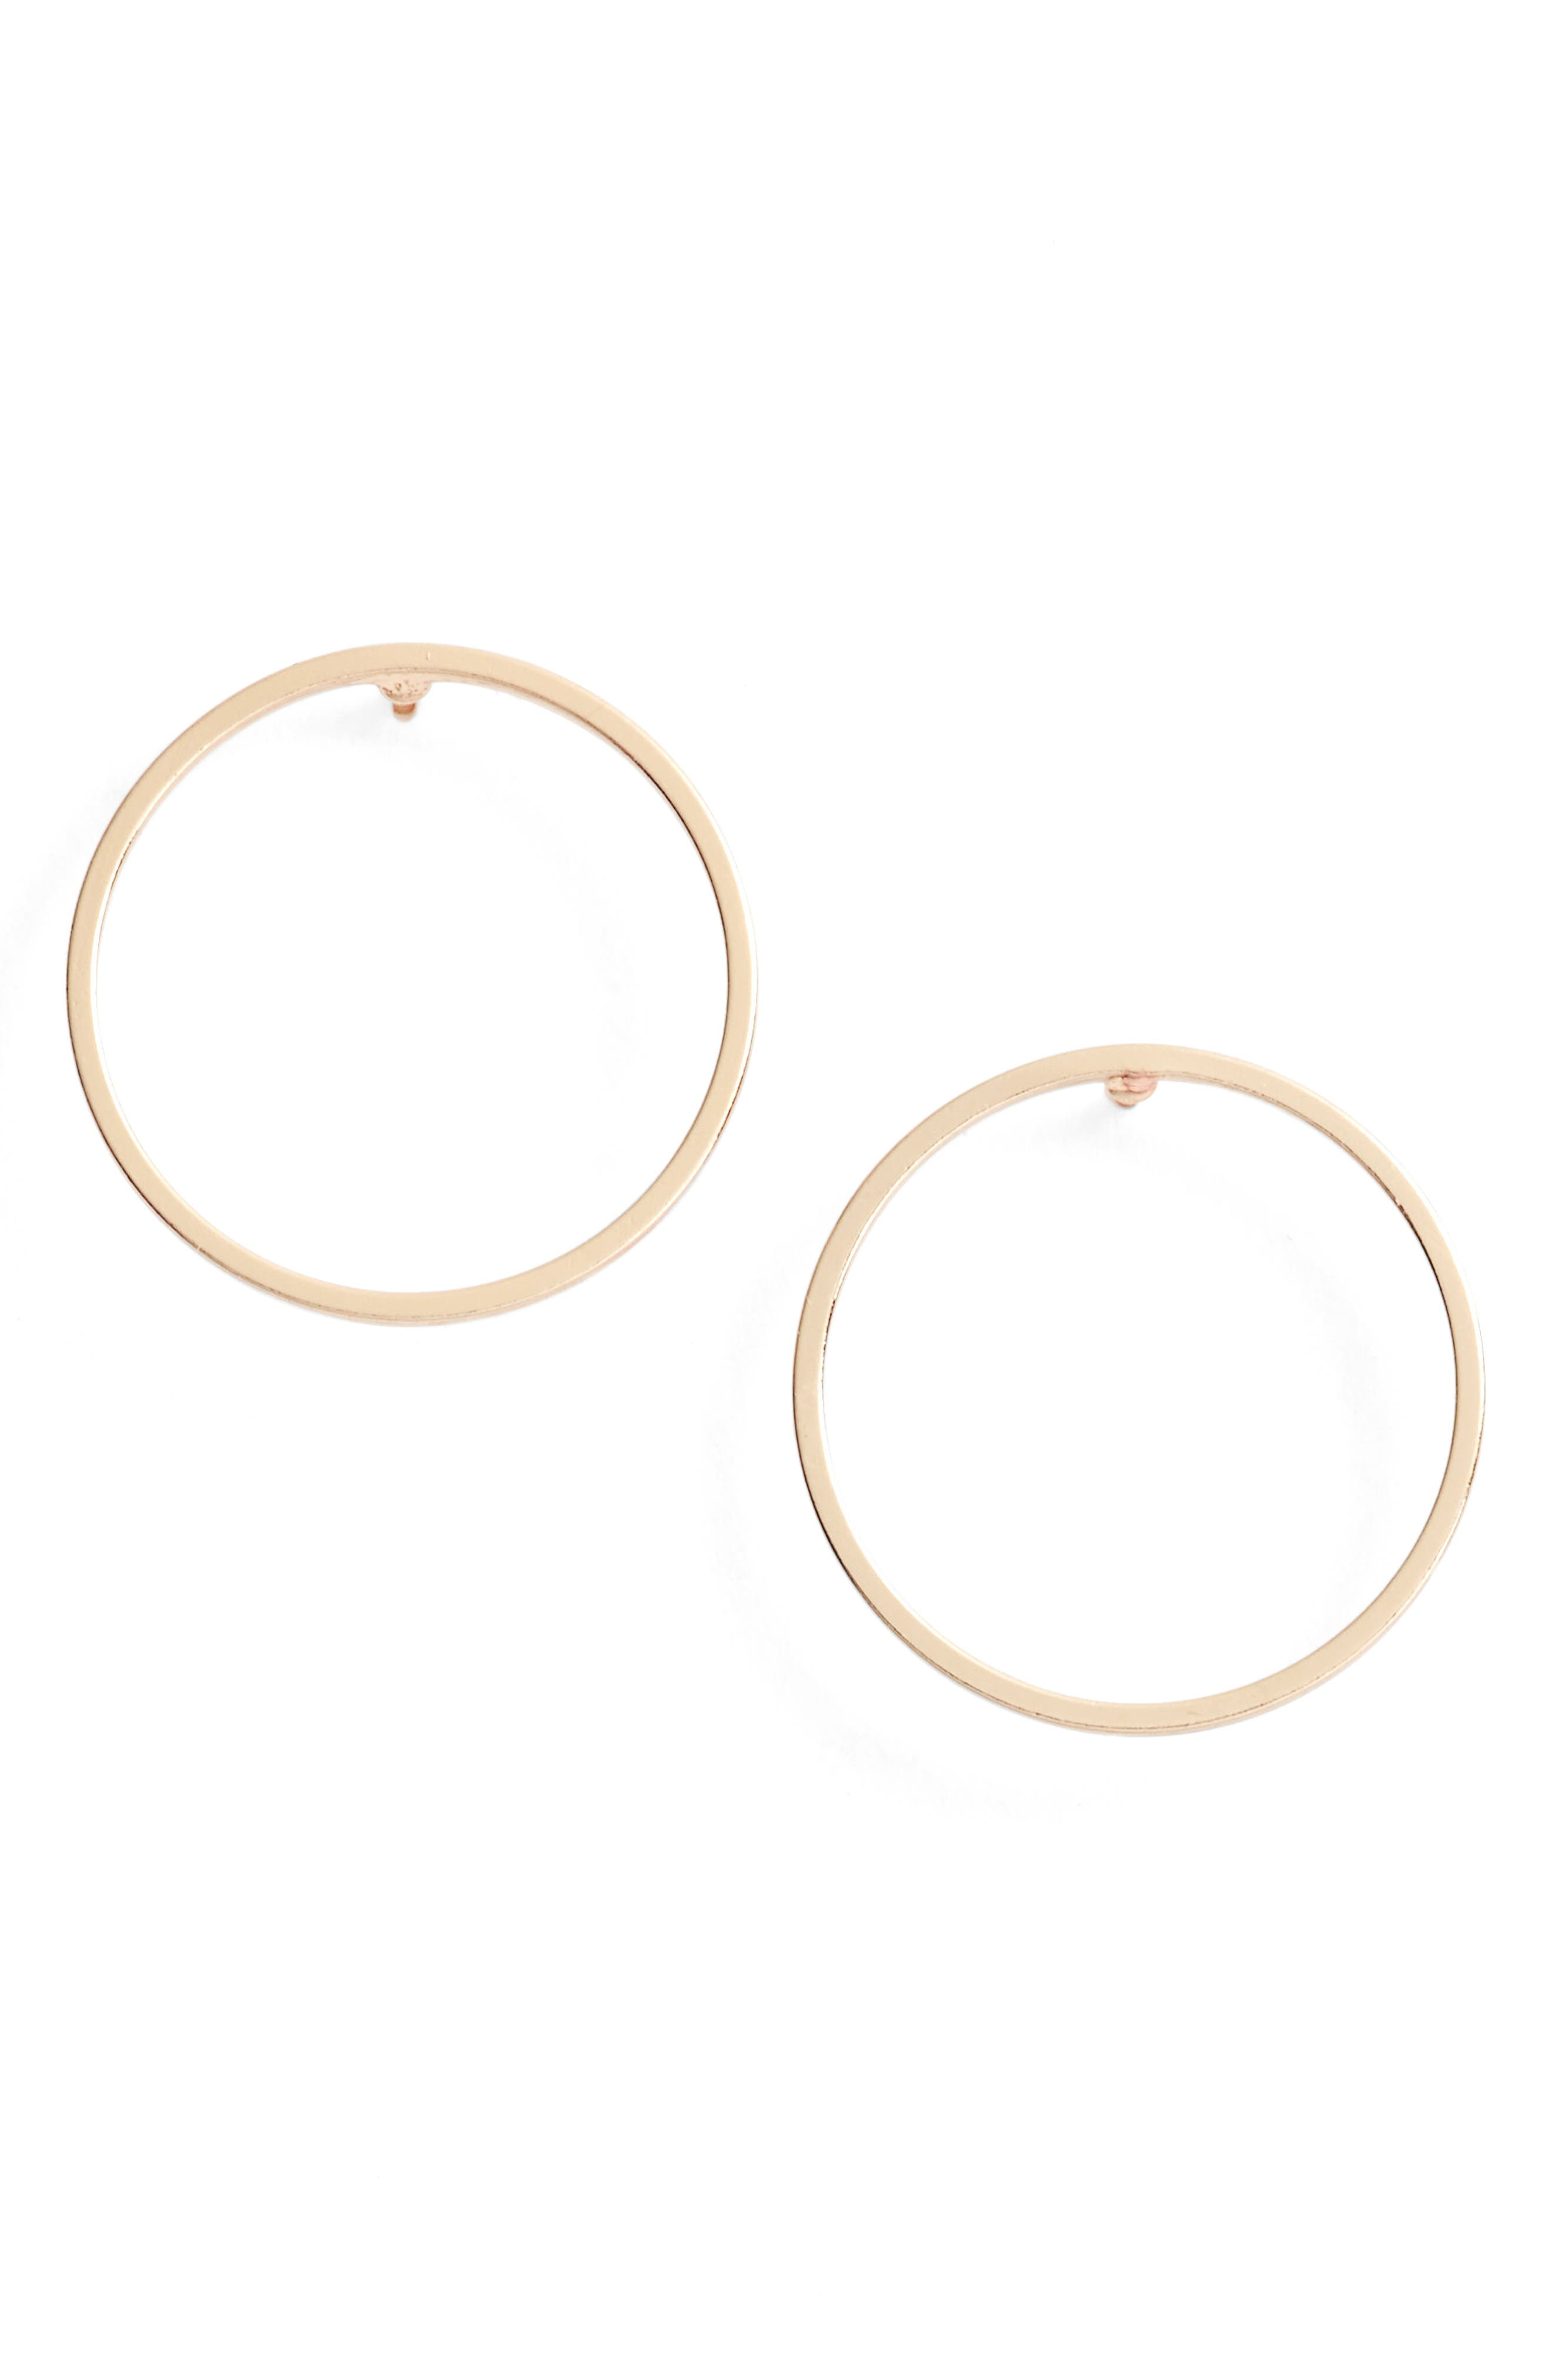 Juliette Circle Earrings,                         Main,                         color, 710